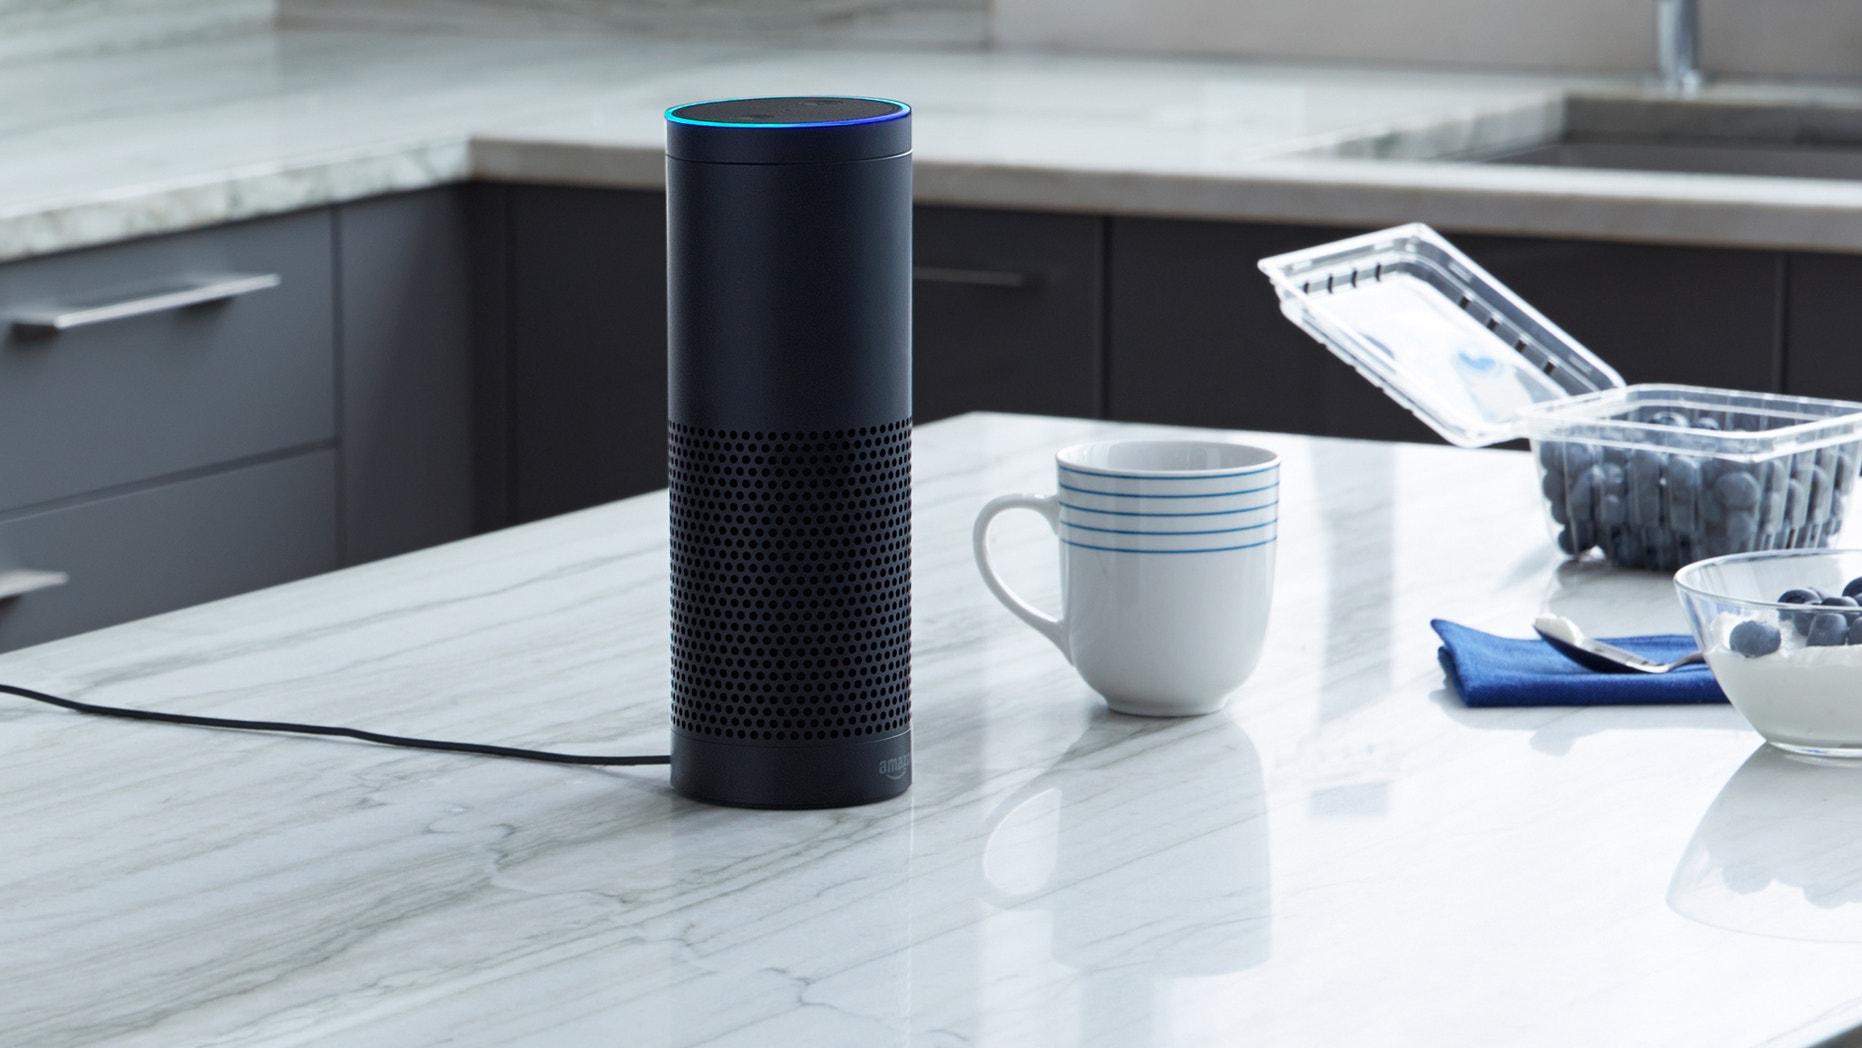 Amazon Echo file photo (Amazon).